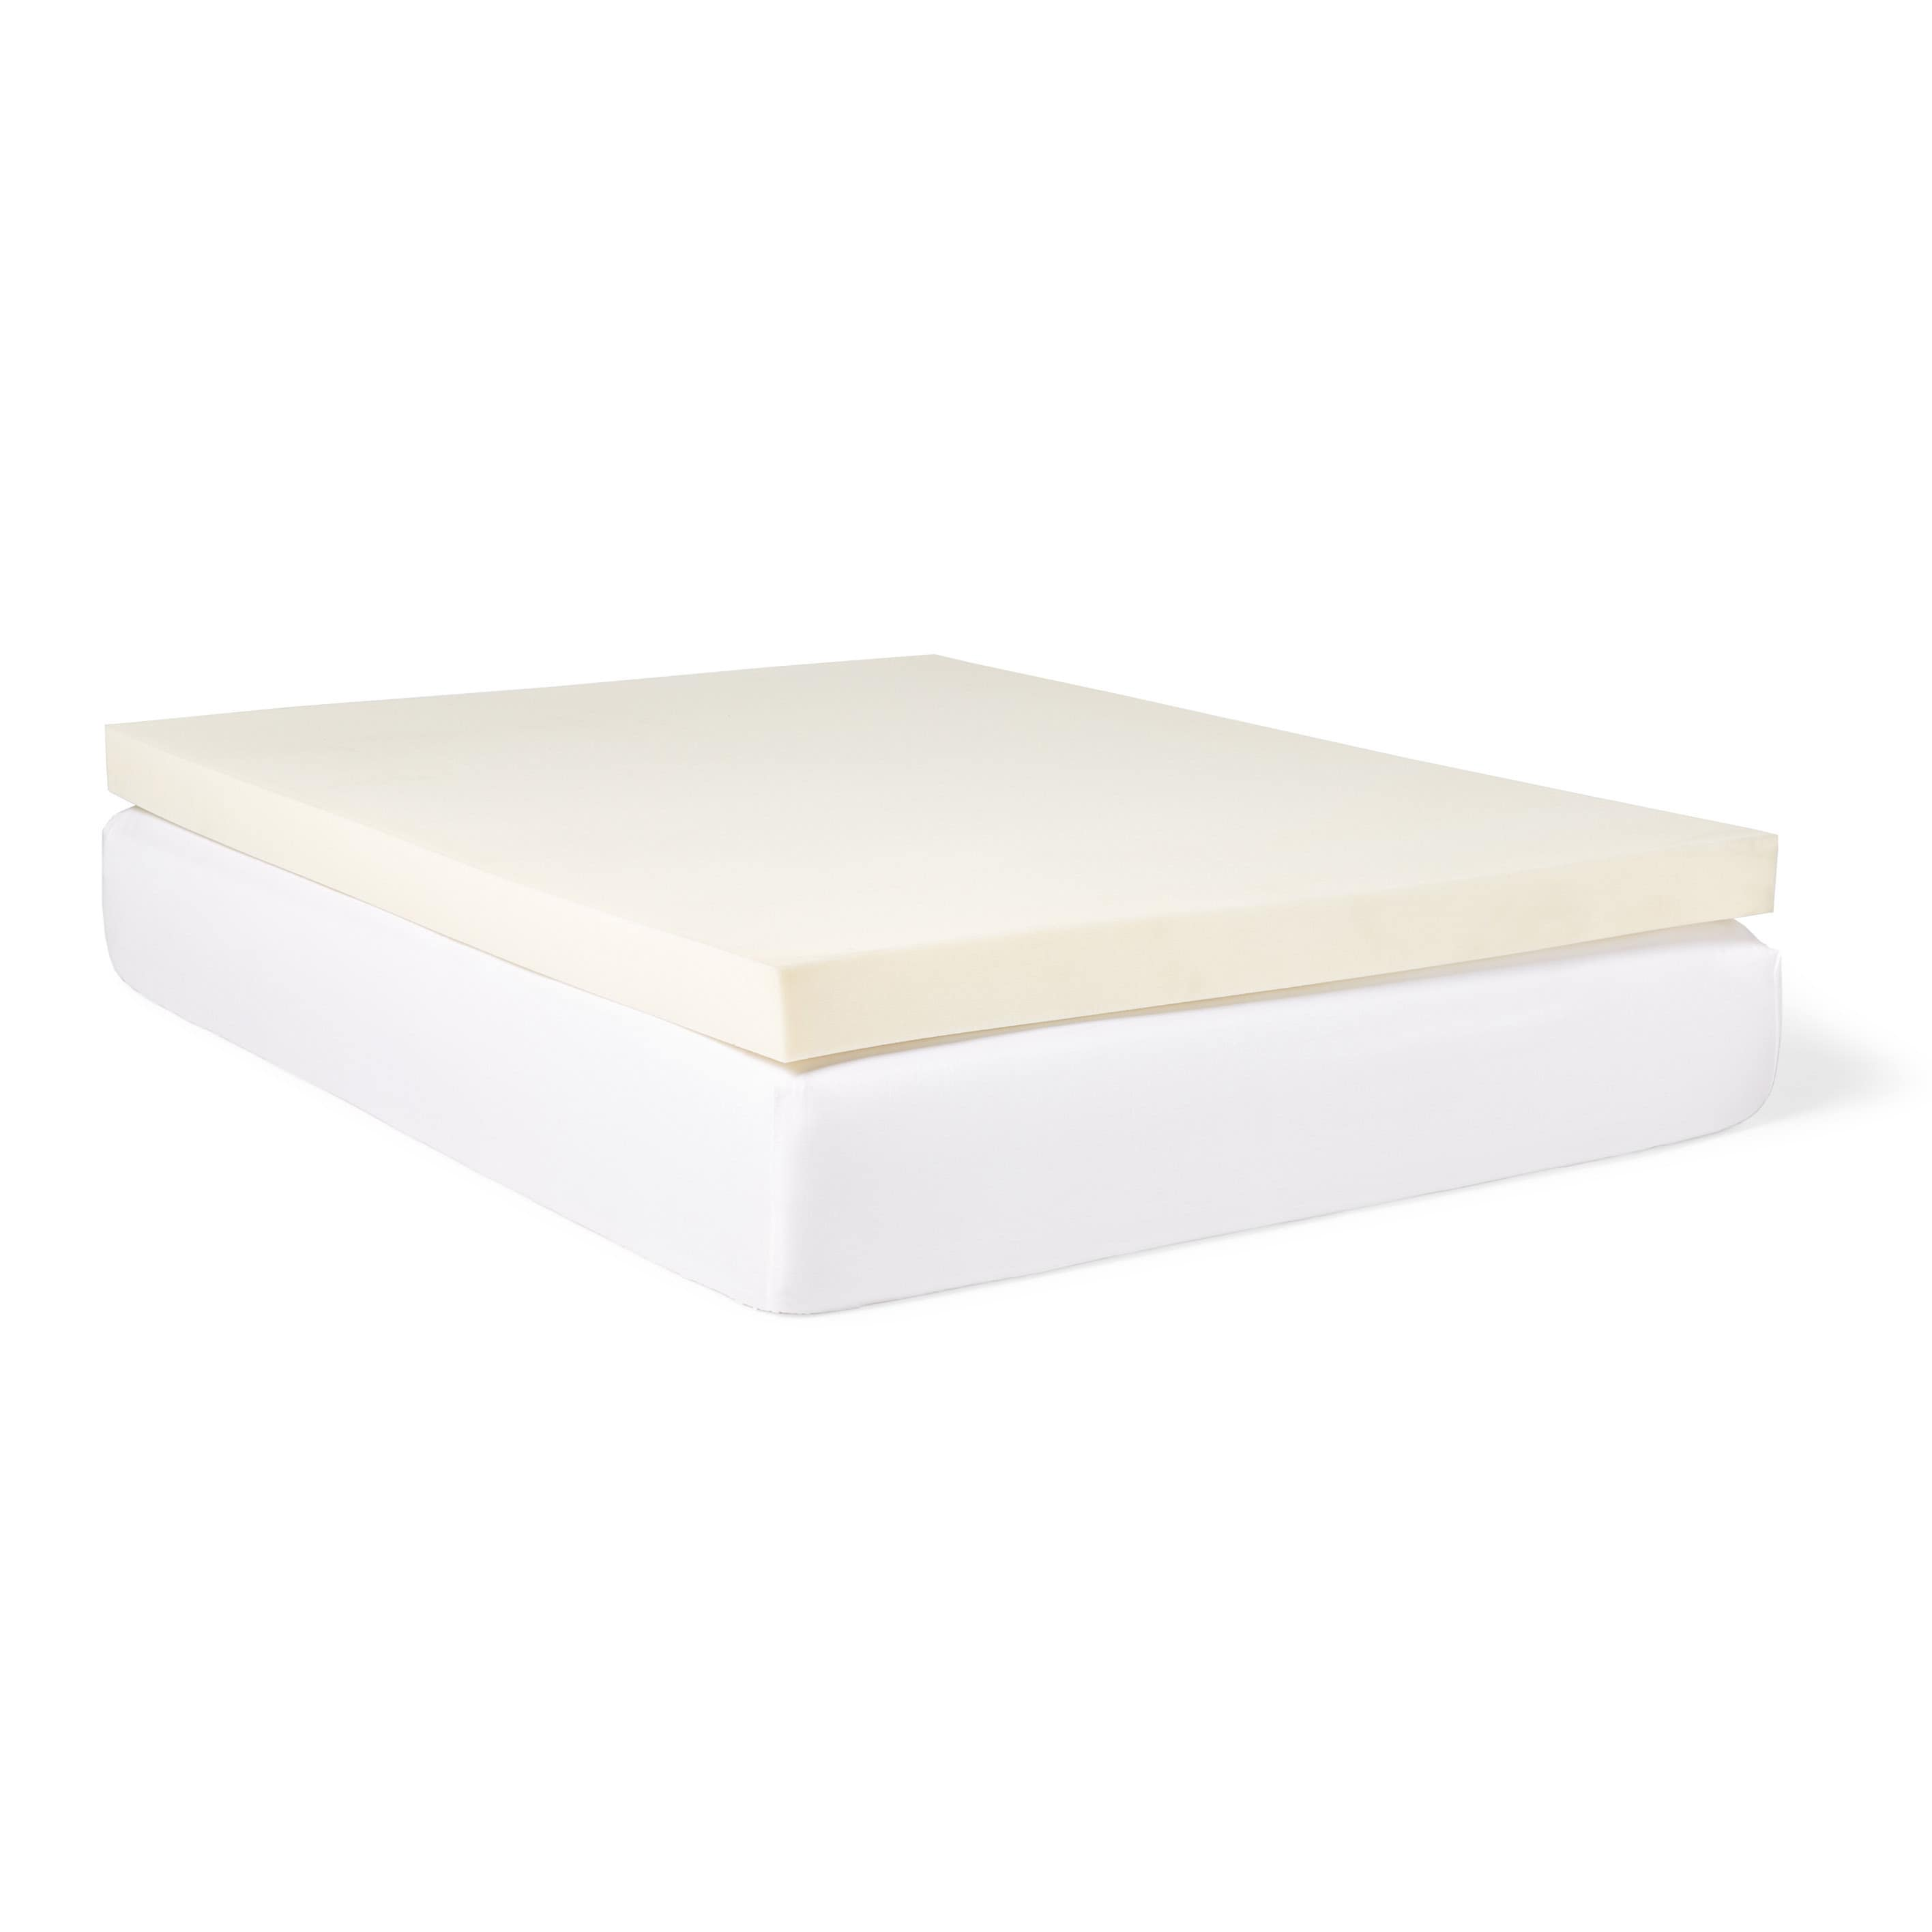 Slumber Solutions 4 Inch Memory Foam Mattress Topper Walmart Com